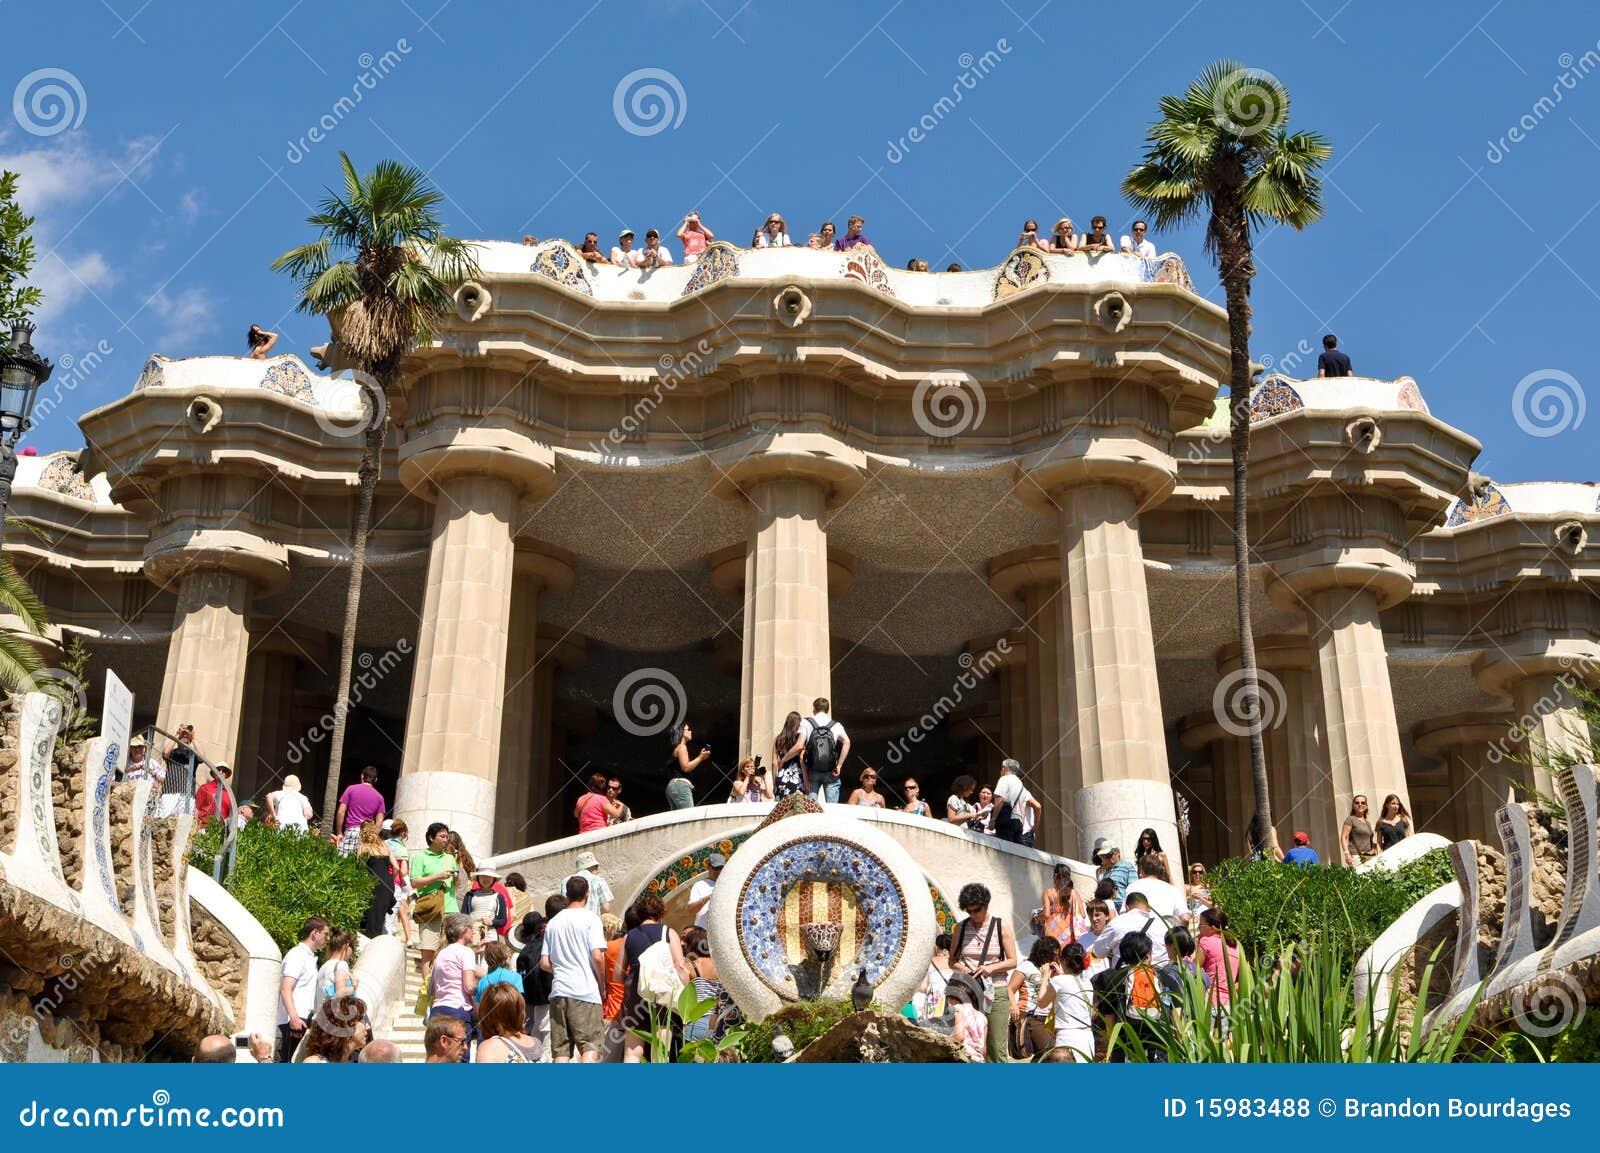 De ingang van guell van het park redactionele stock foto afbeelding 15983488 - Ingang van het hedendaagse huis ...